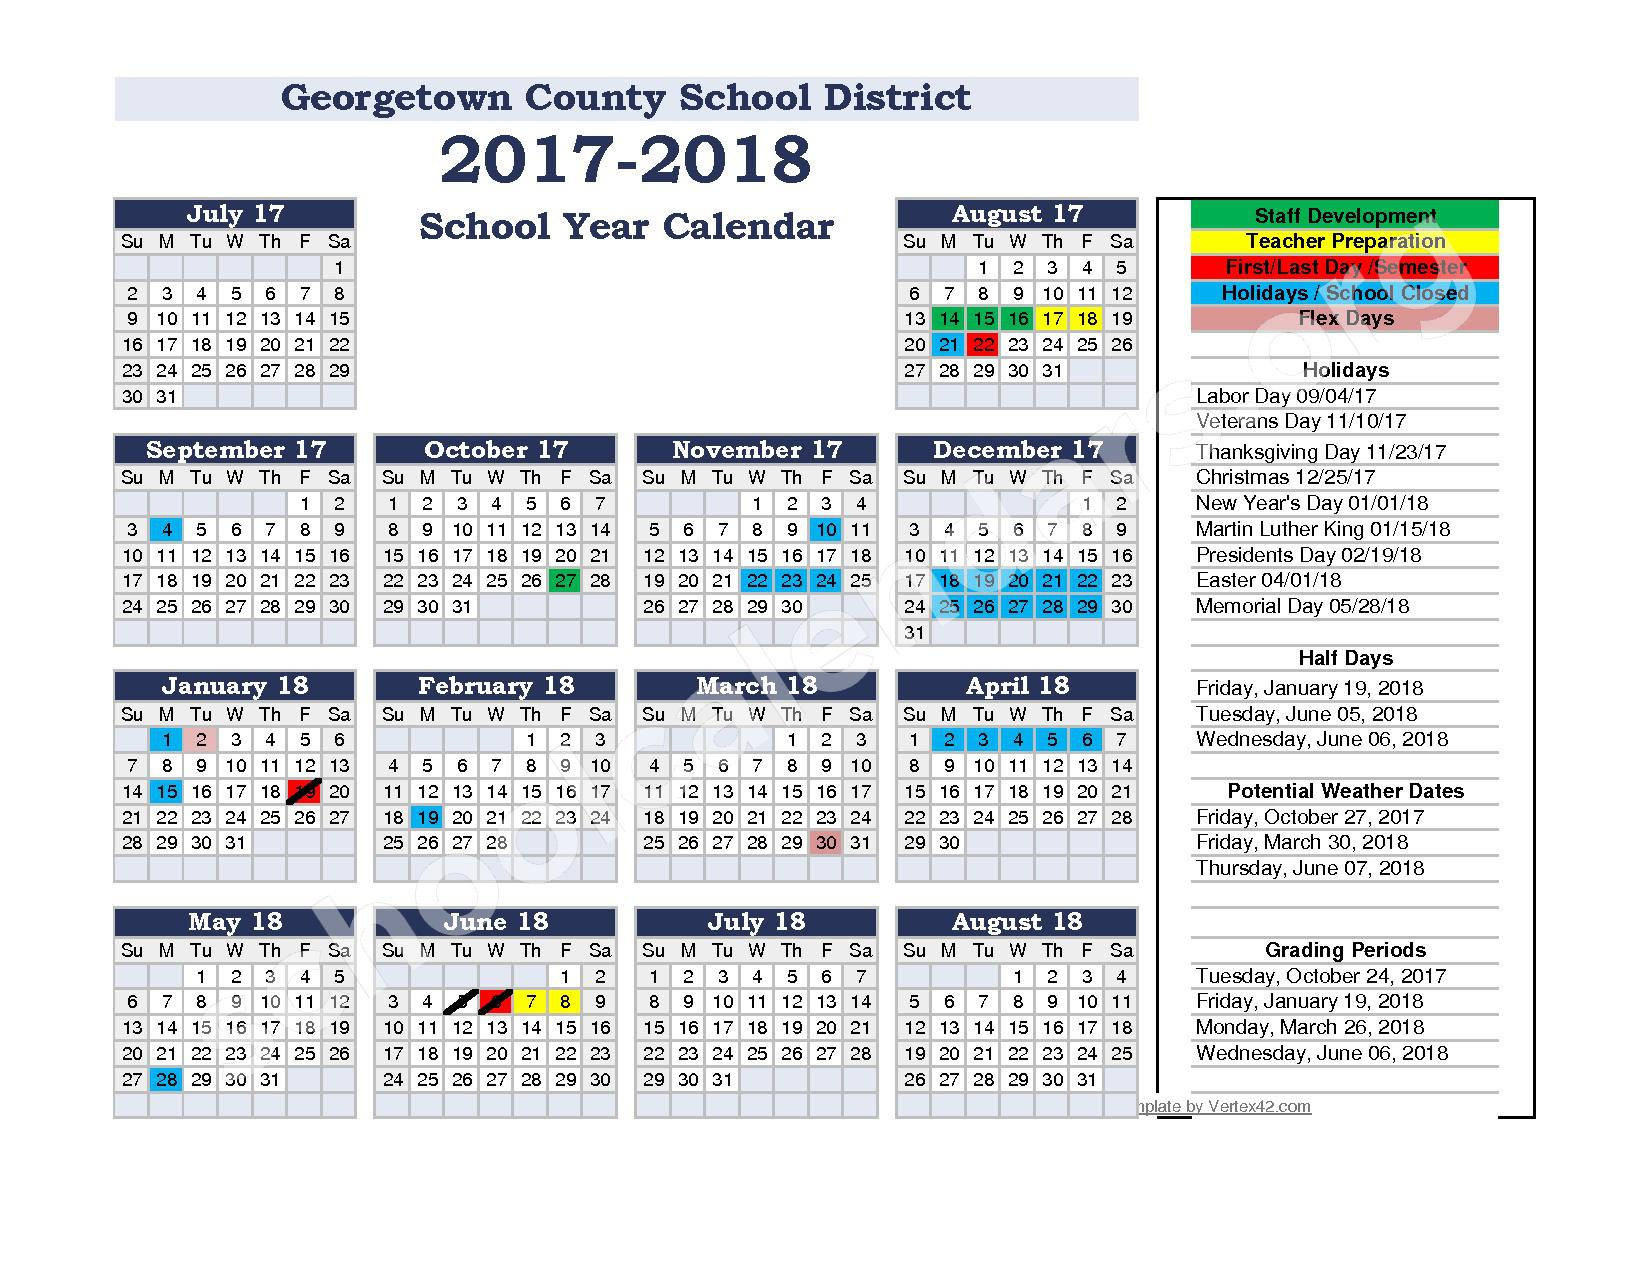 2017 - 2018 School Calendar – Georgetown County School District  – page 1